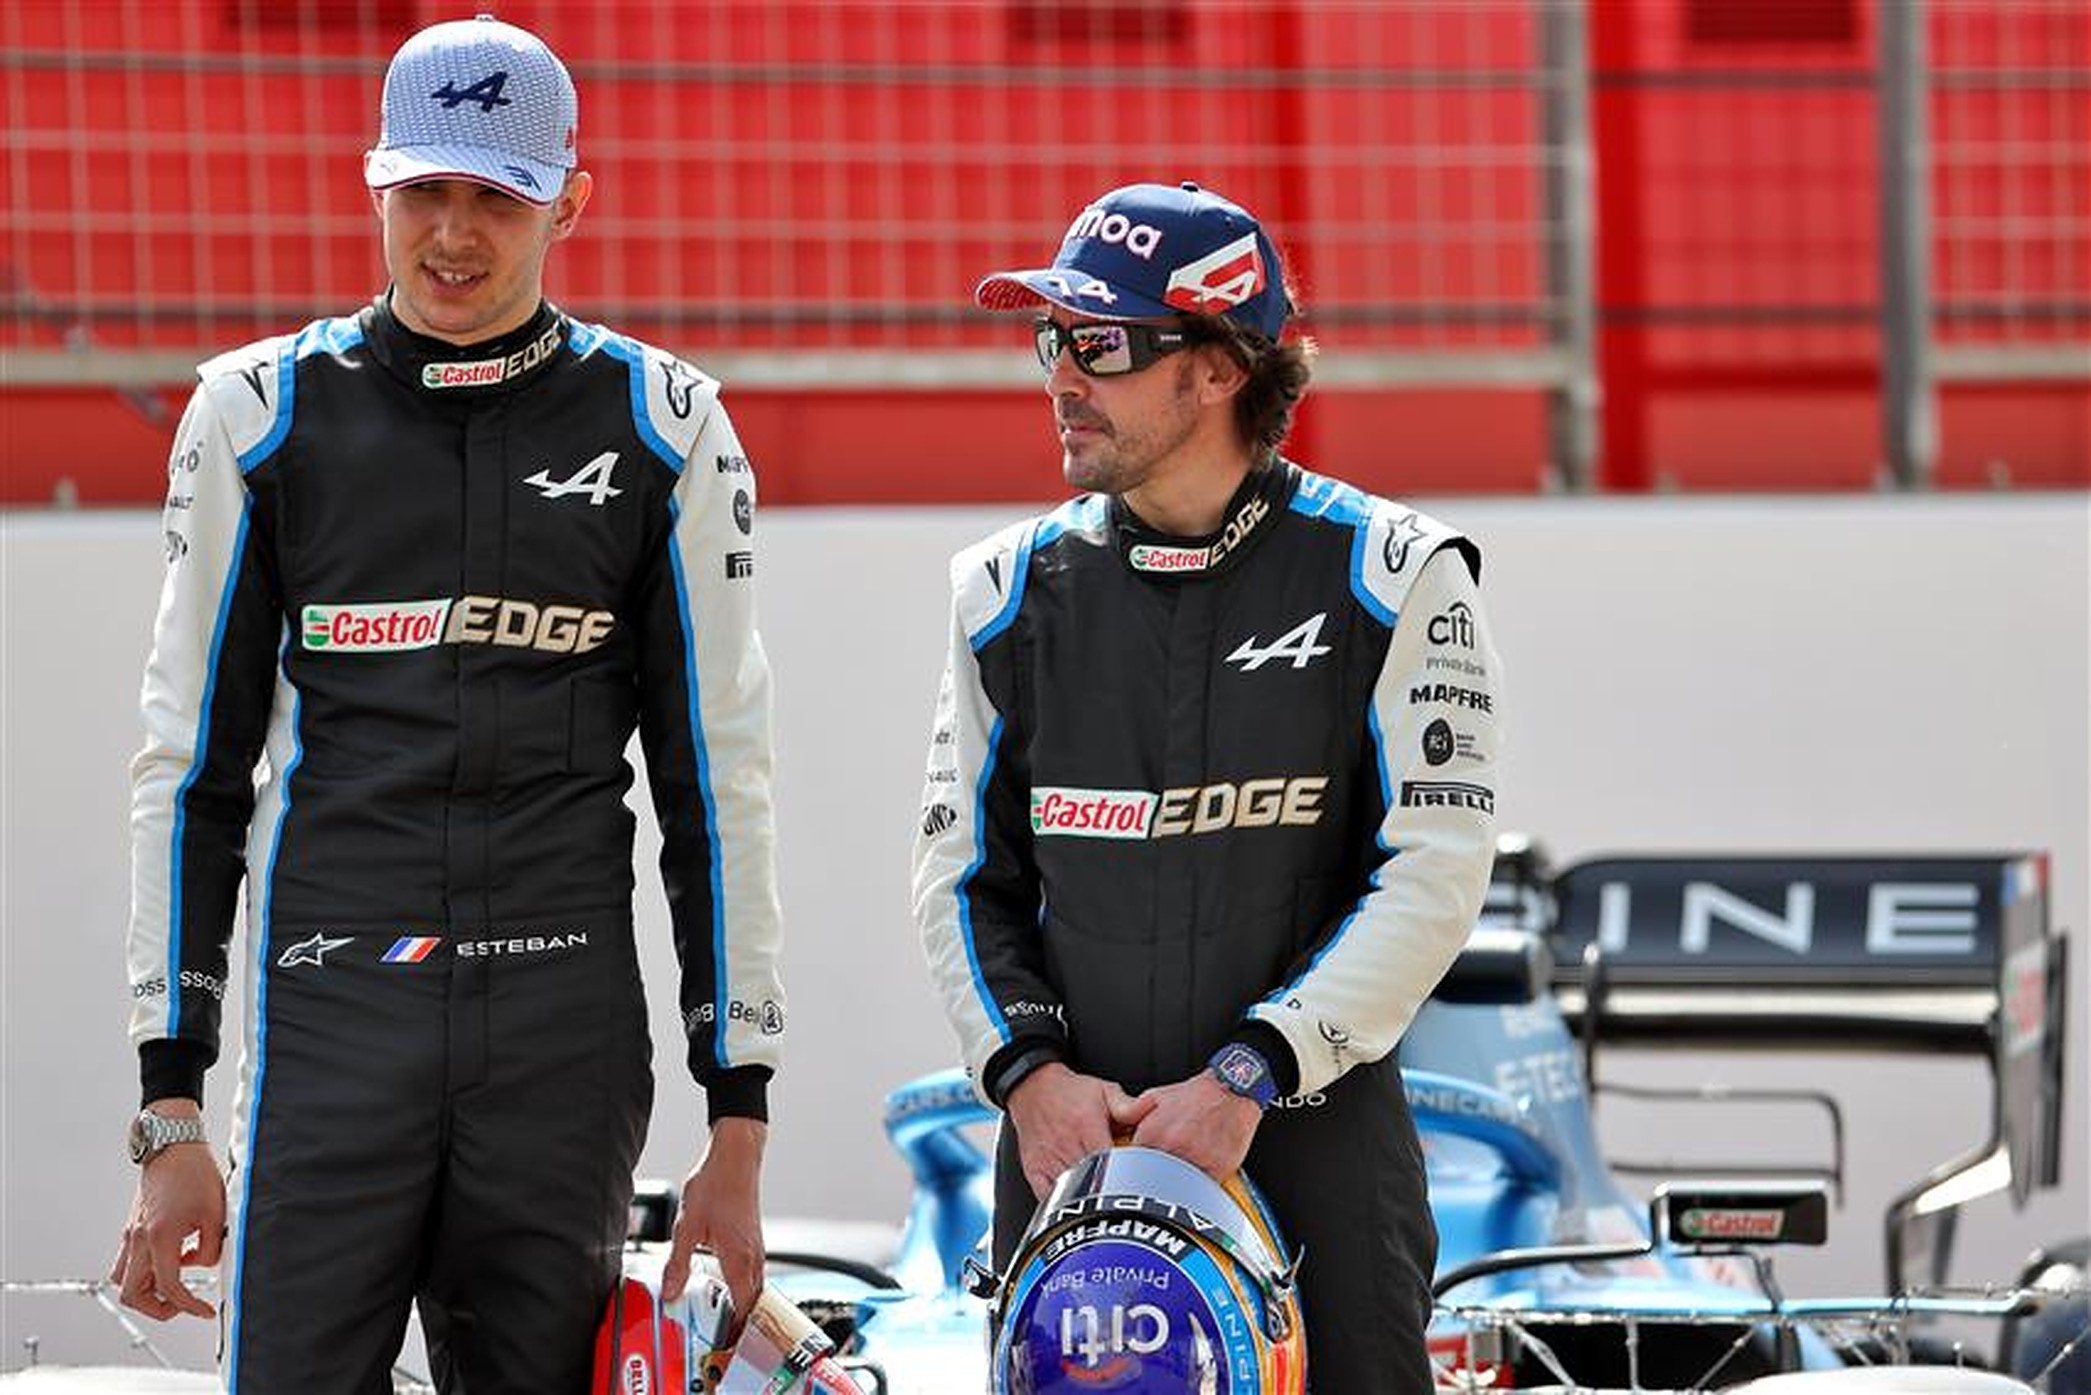 Fernando Alonso and Esteban Ocon at Alpine in 2021 Bahrain - Formula1news.co.uk